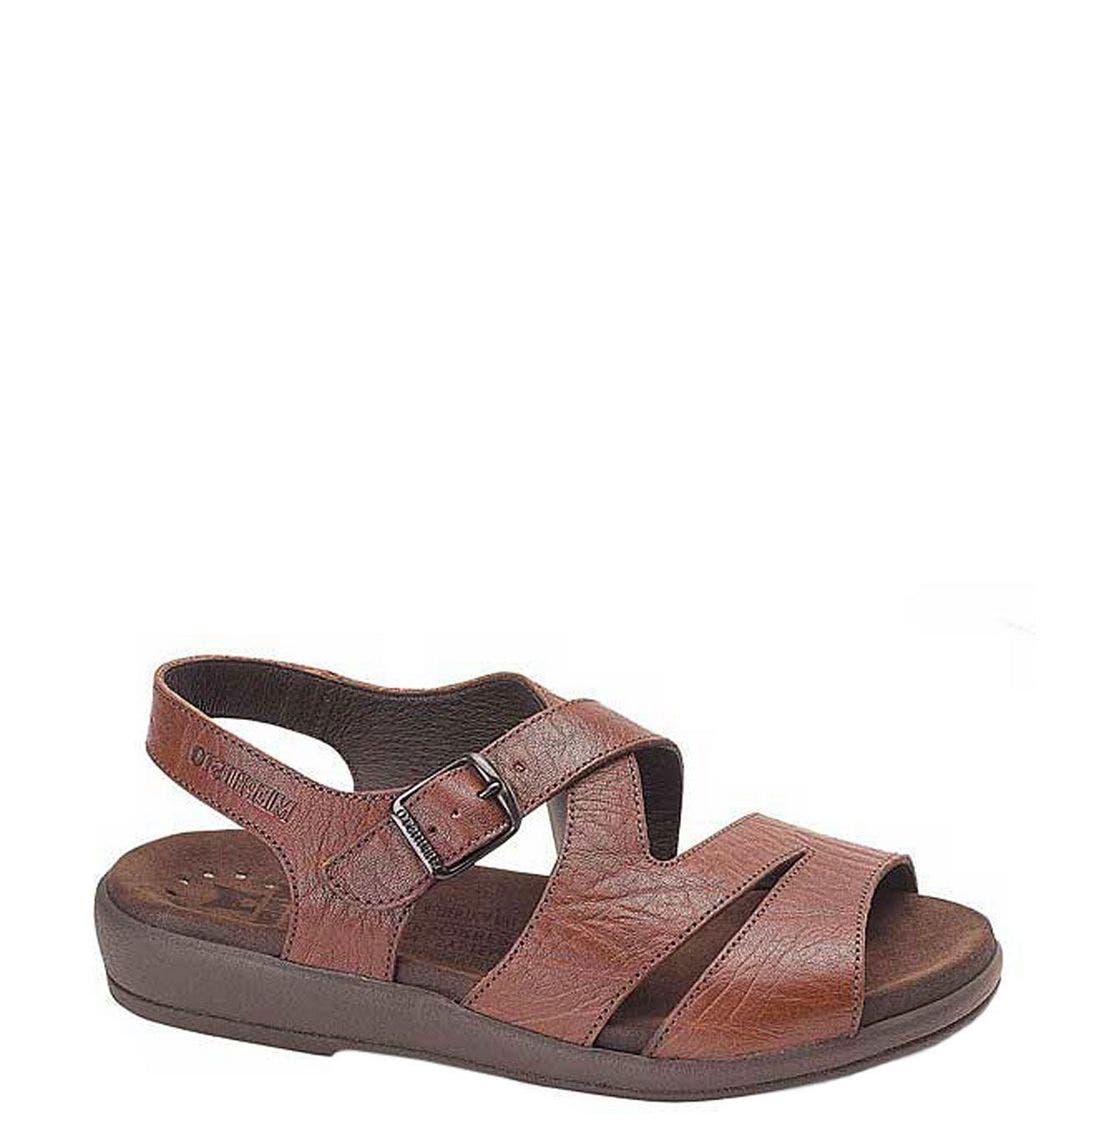 Main Image - Mephisto 'Altina' Sandal